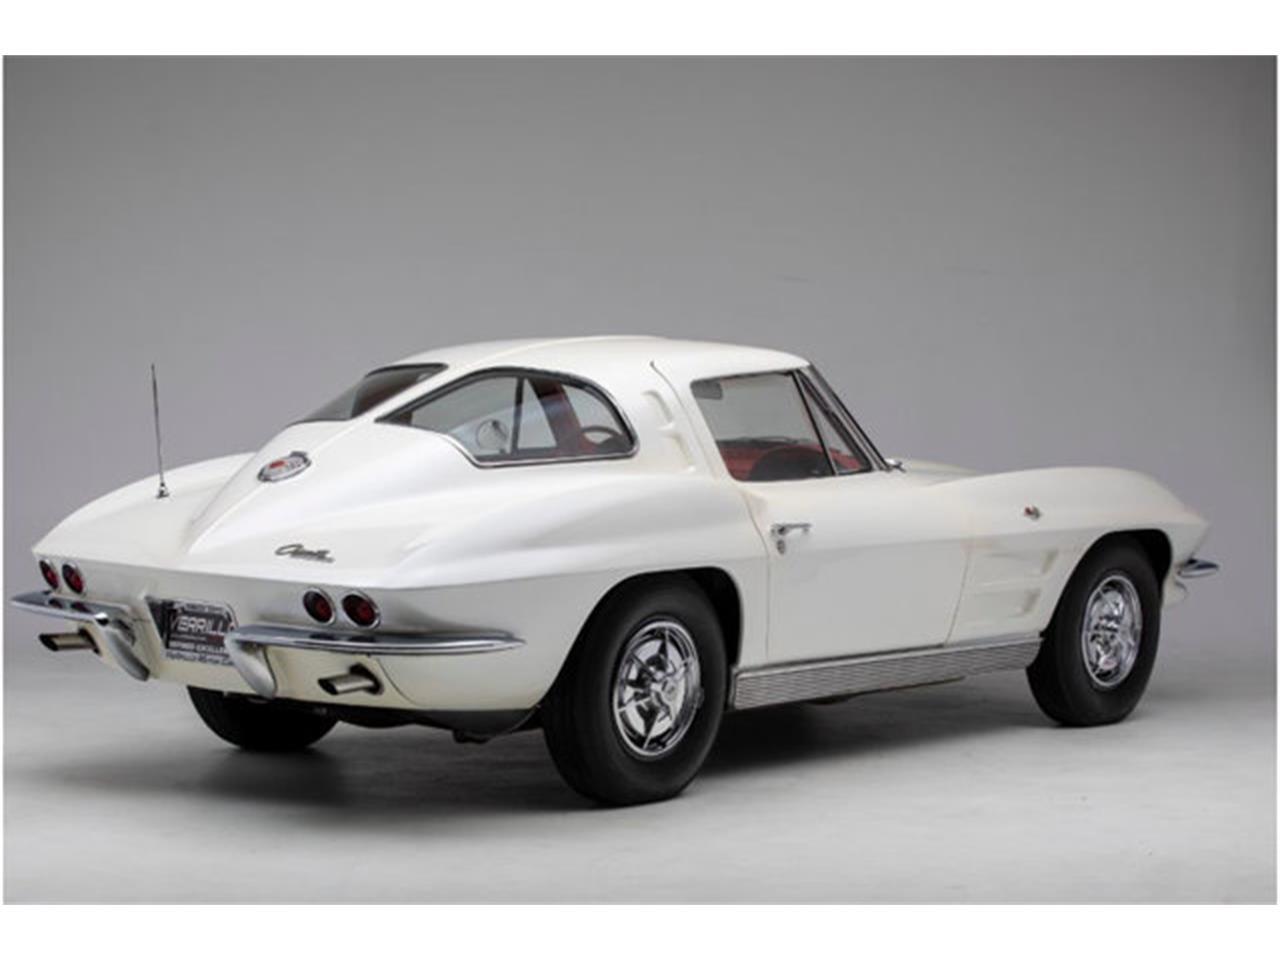 Large Picture of Classic '63 Chevrolet Corvette located in New York - QOXV